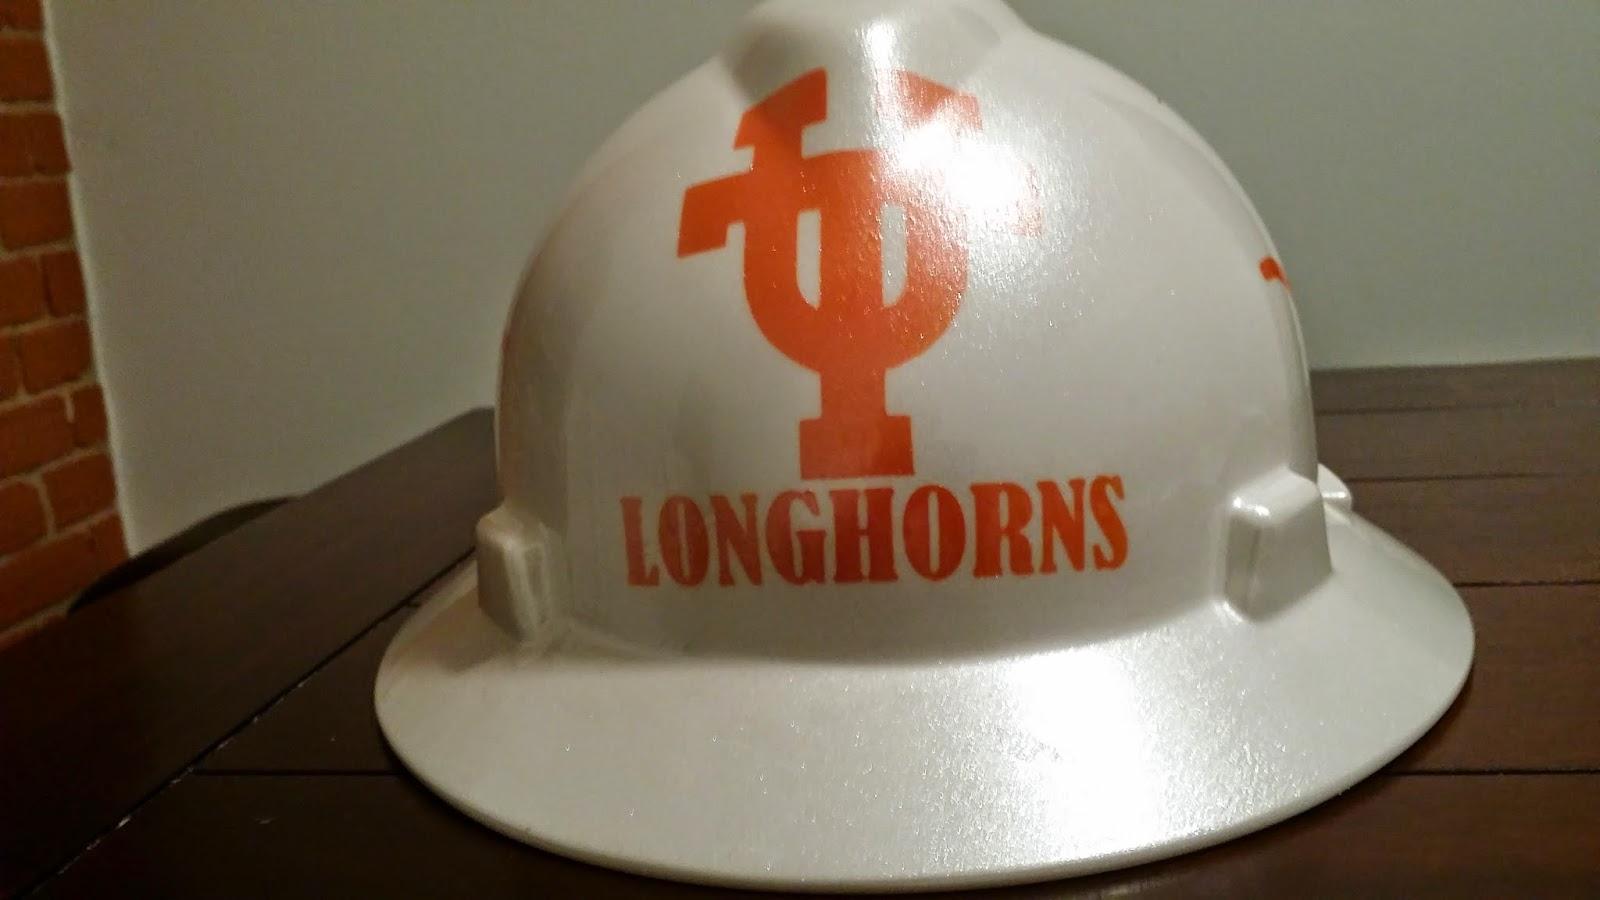 White and Orange UT Longhorns hard hat